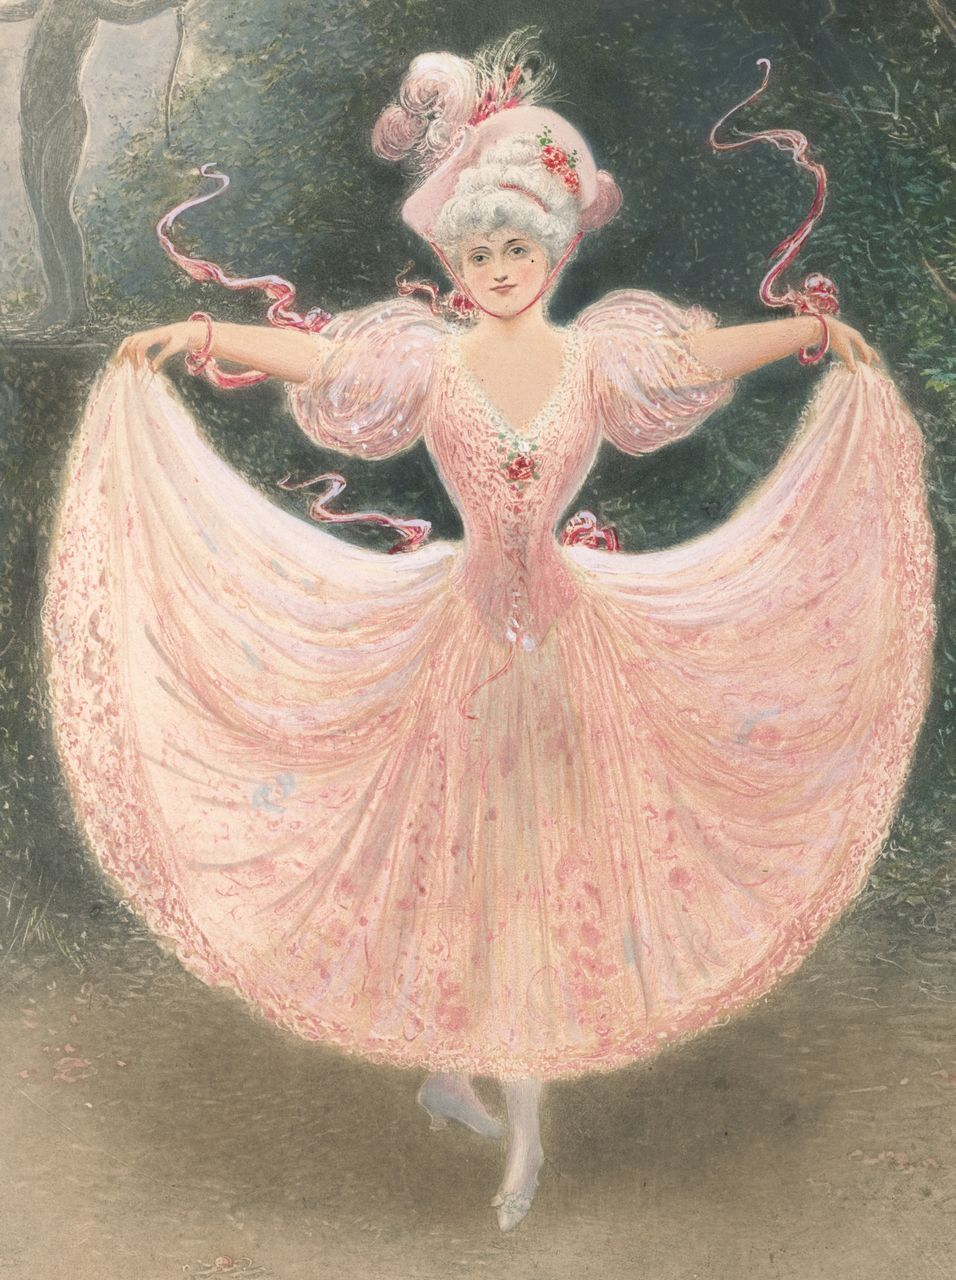 Antique Victorian Ballerina in Pink Dress, Original Signed Color Print, La Danseuse, 1895 Ballet